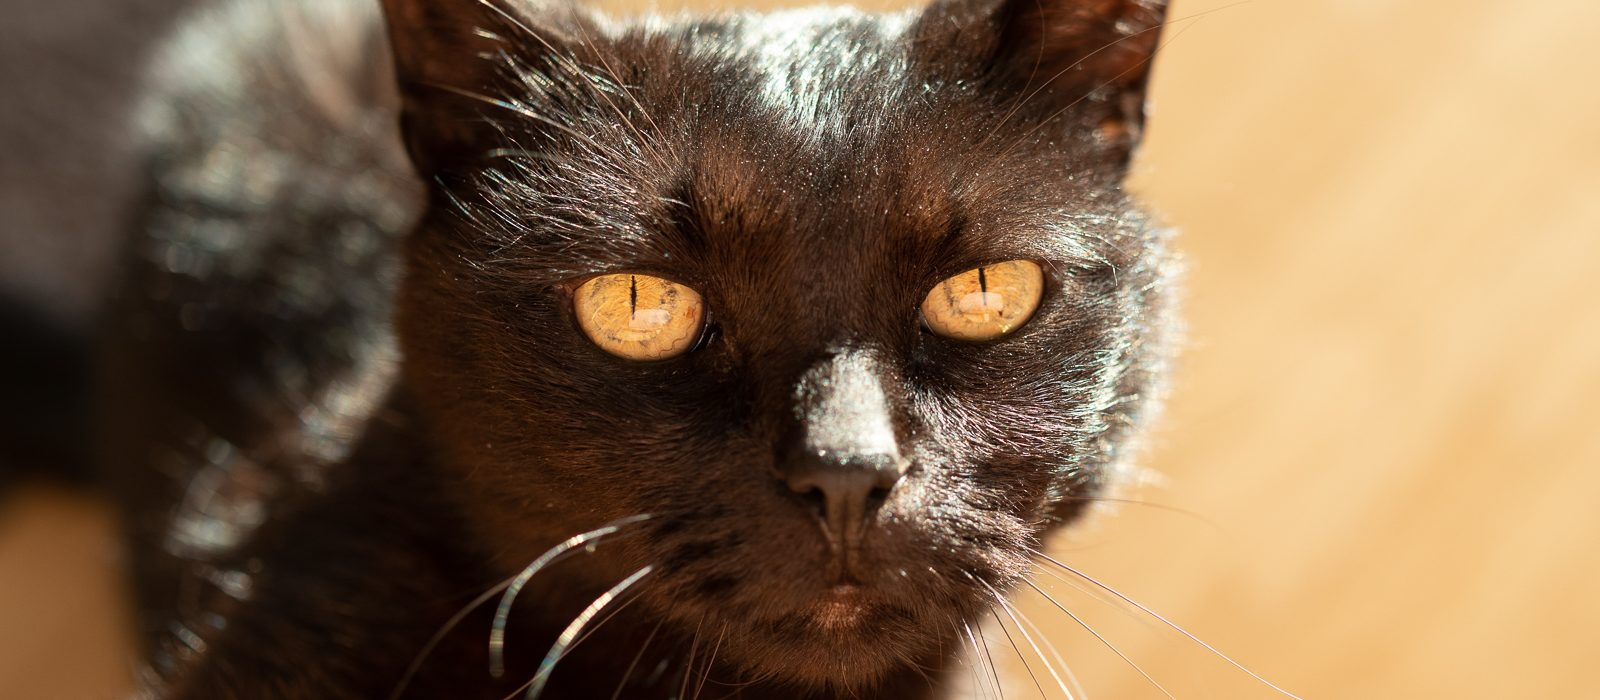 Foto Trick - zentrierte Katze | Norbert Eder Photography